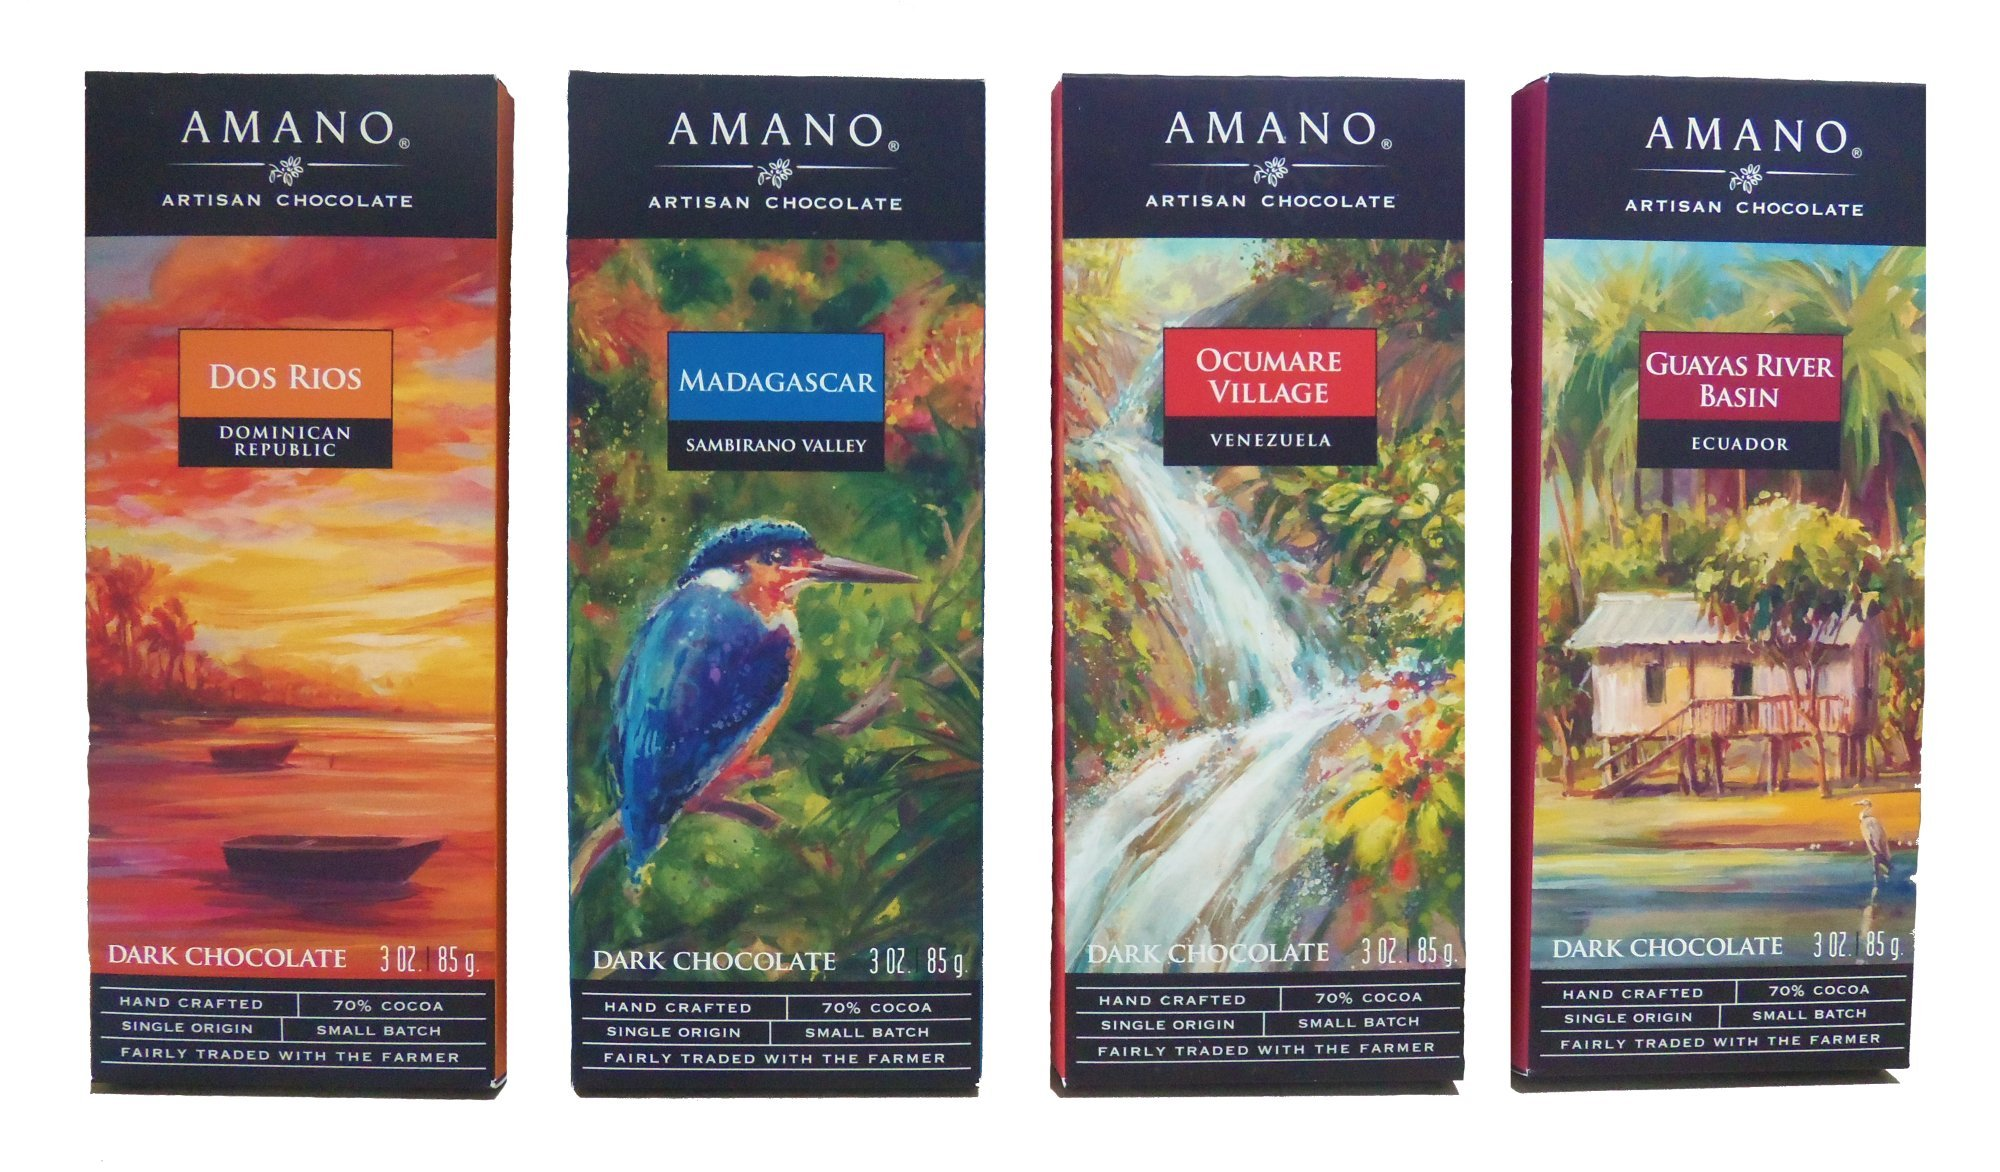 Amano Artisan Dark Chocolate Bar Variety Quartet - Dos Rios, Madagascar, Ocumare, & Guayas River Basin - 4 Bars, 3 Ounces Per Bar - Academy of Chocolate Award Winners! by Amano